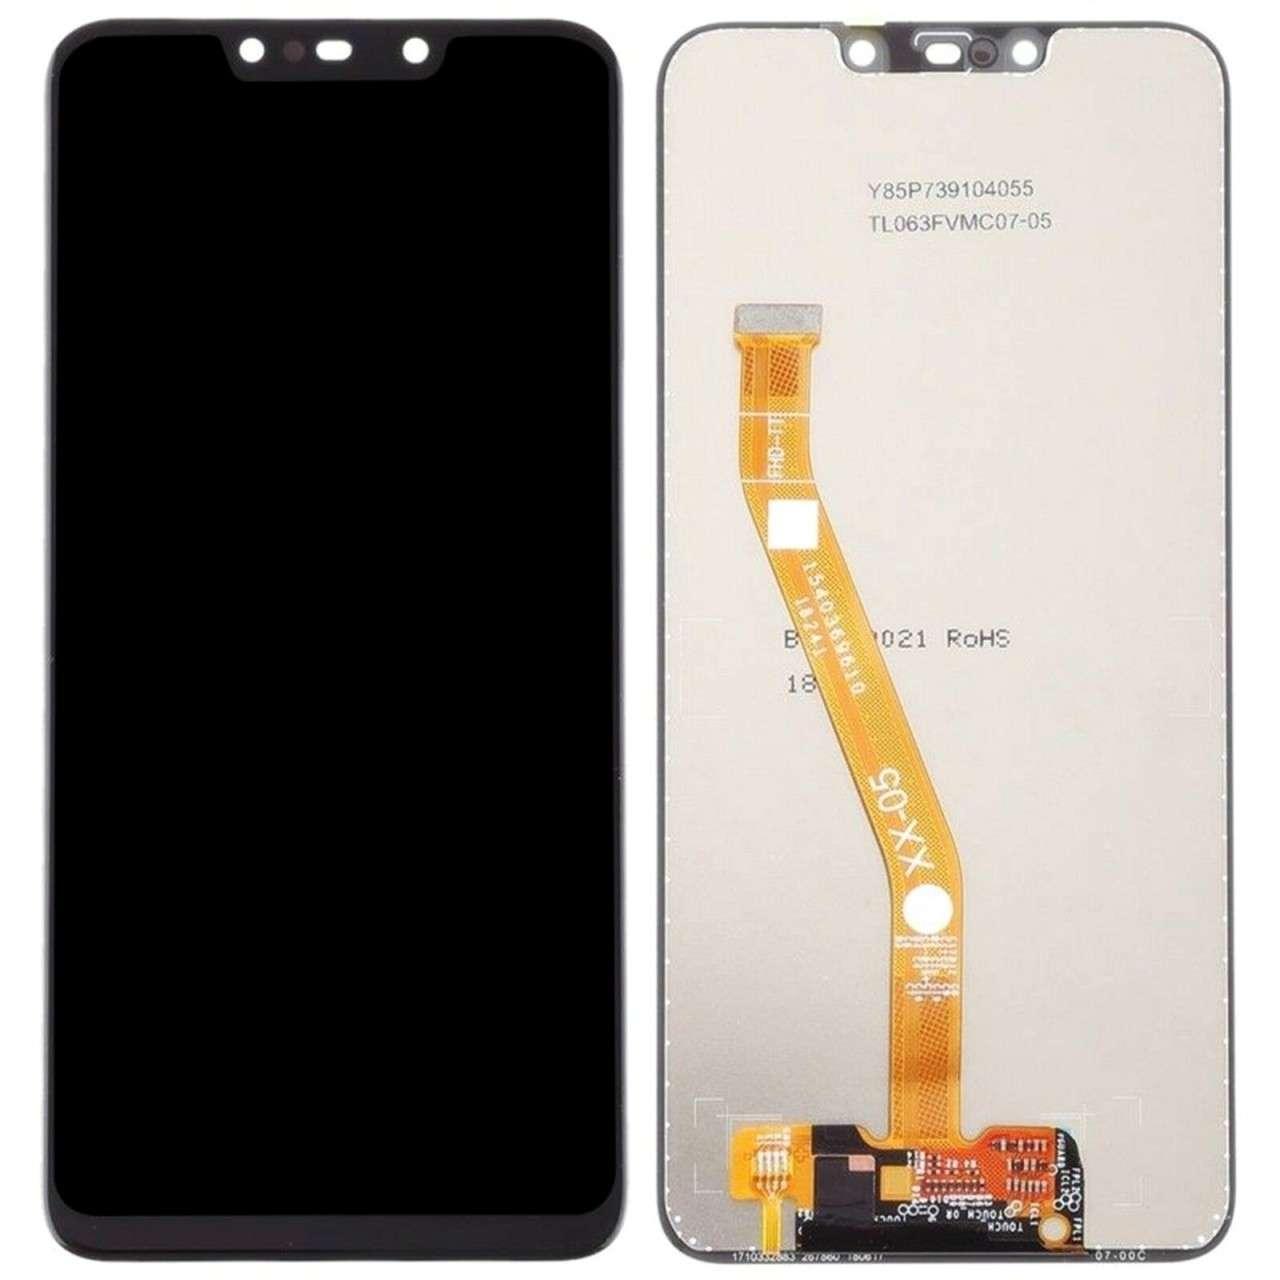 Display Huawei P Smart Plus 2018 Black Negru imagine powerlaptop.ro 2021